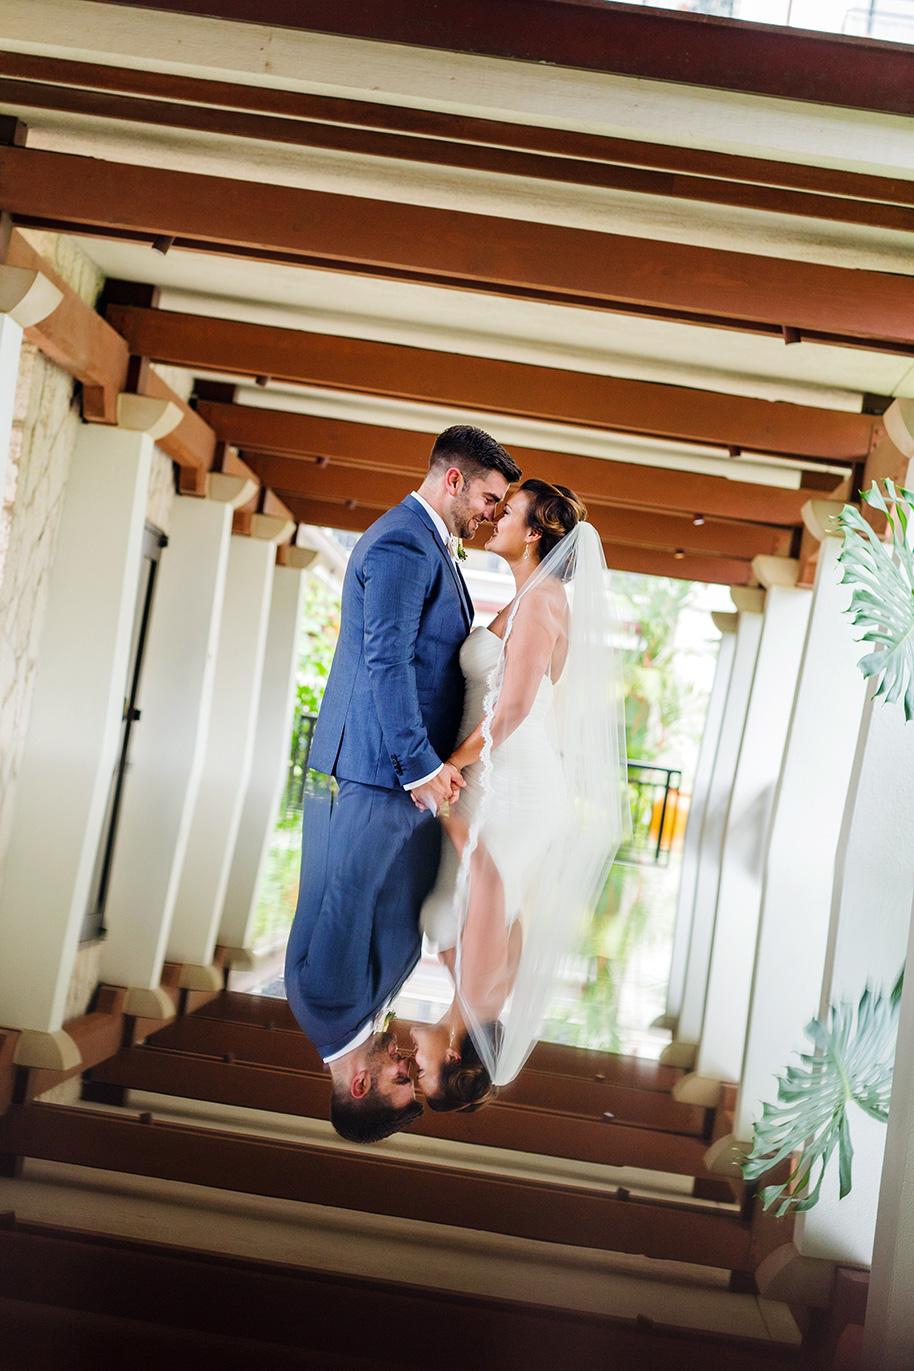 Paradise-Cove-Wedding-040816-10